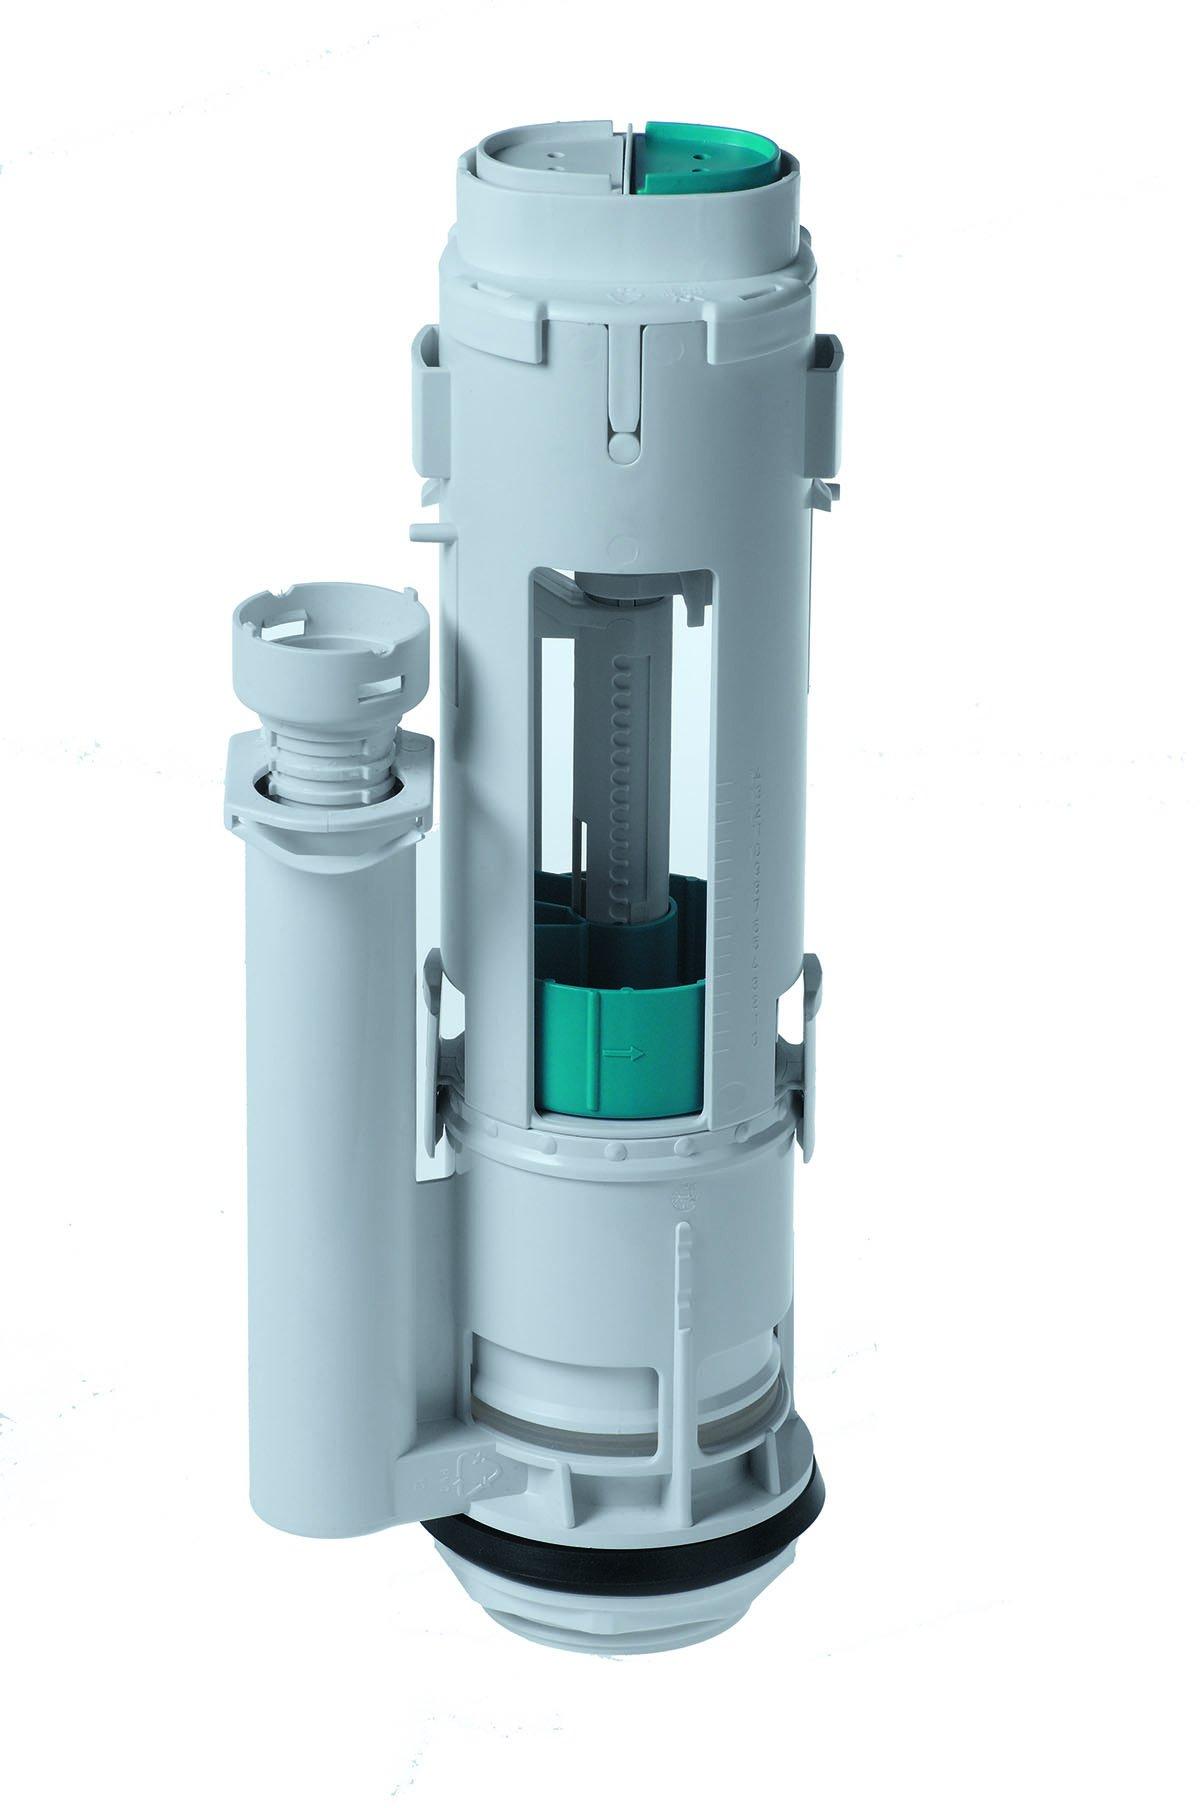 KOHLER 1097231 Genuine Part Flush Valve Kit, Unfinished by Kohler (Image #1)